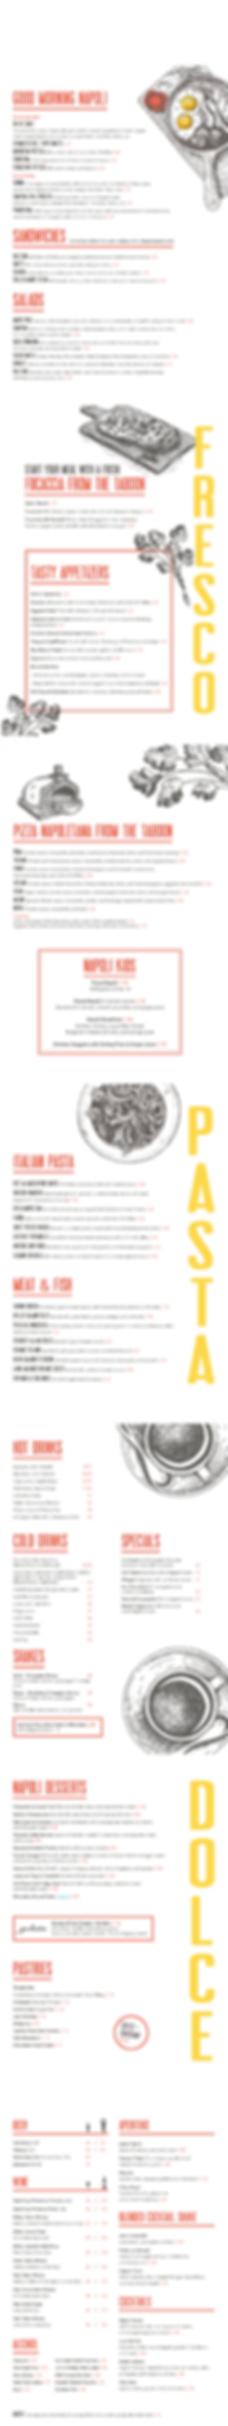 NAPOLI menu E_png_Page_22-02.png